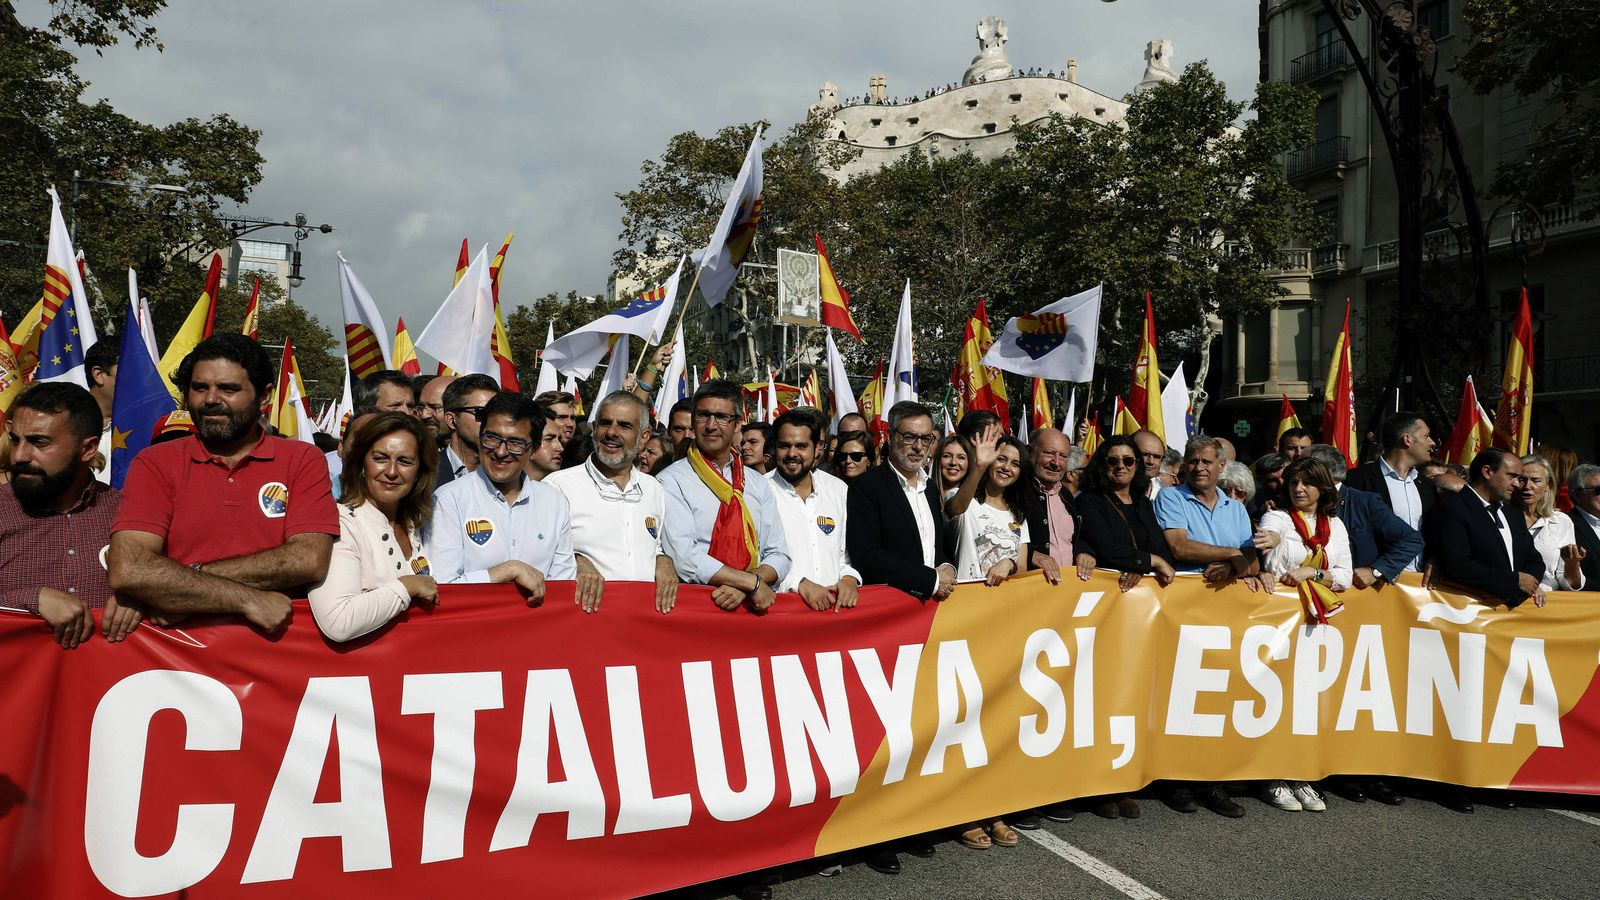 Foto: ManifestaciÓn convocada por societat civil catalana (scc)